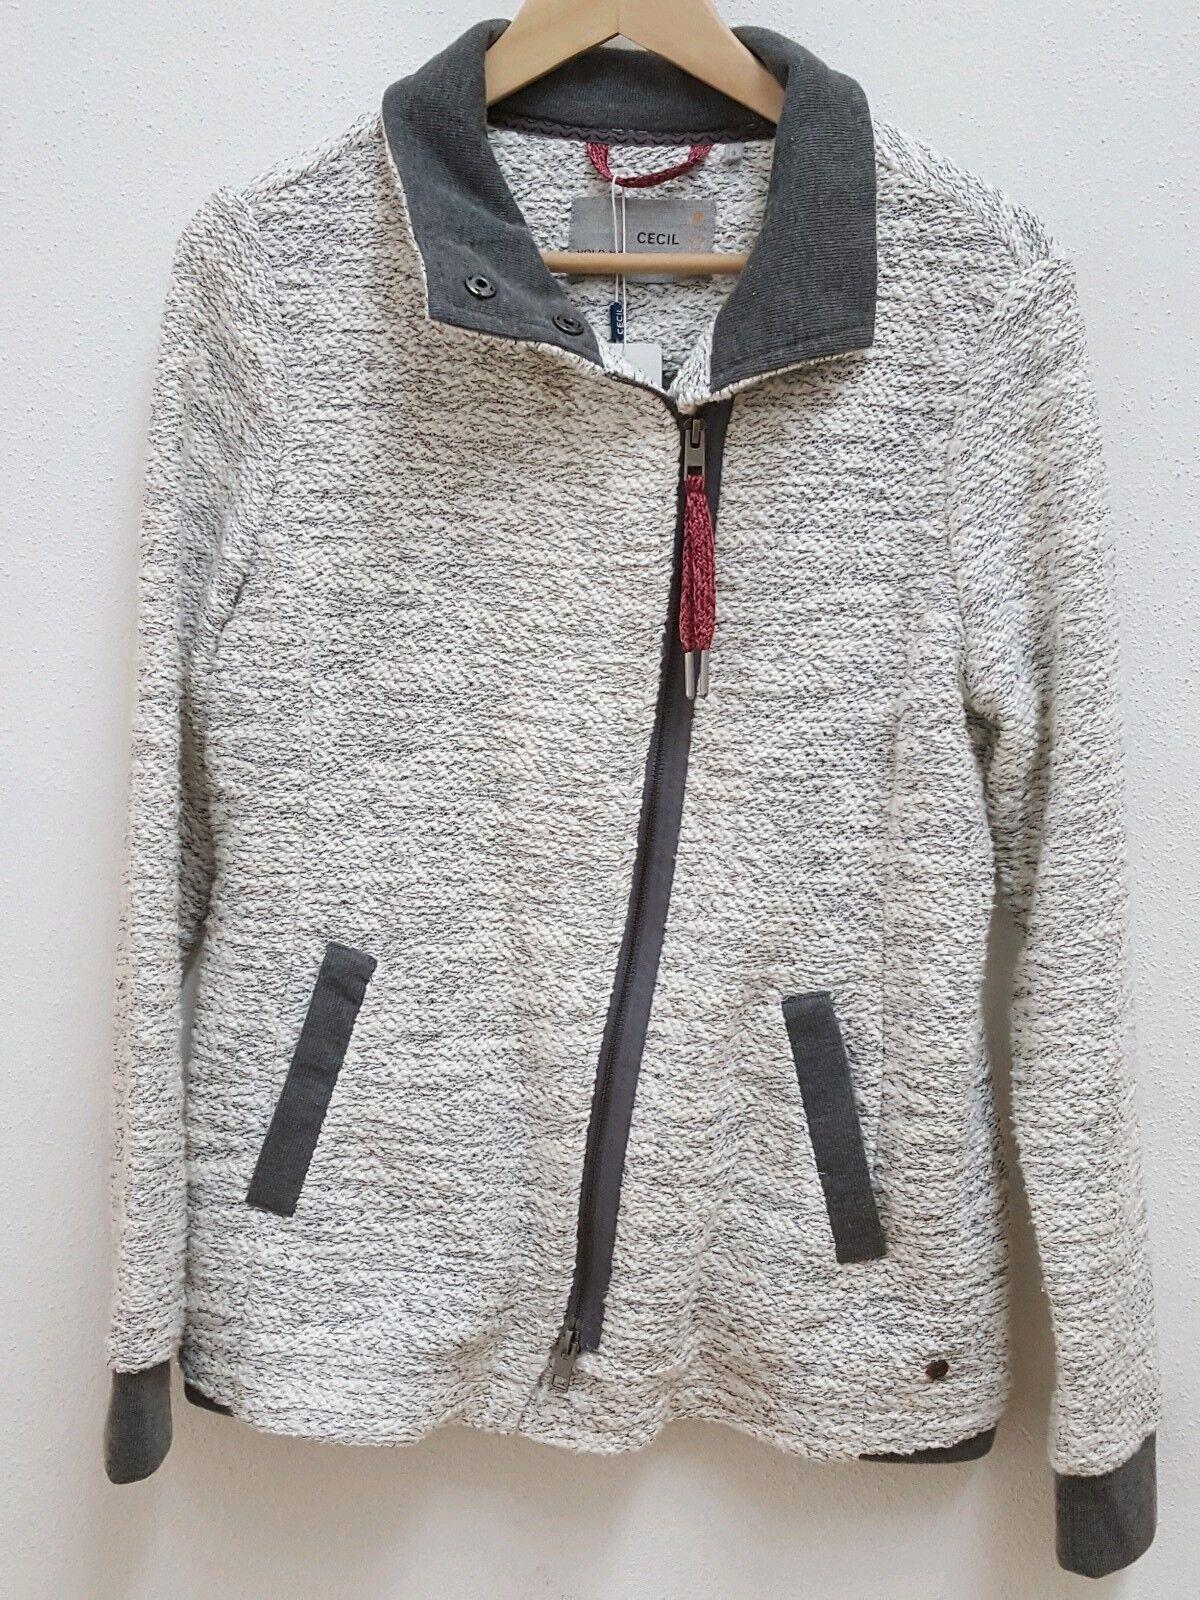 dbe434a3574676 Cecil Strickfleecejacke Jacke Damen grau weiß S NEU Gr.36 meliert  nqcfwx6070-neue Kleidung